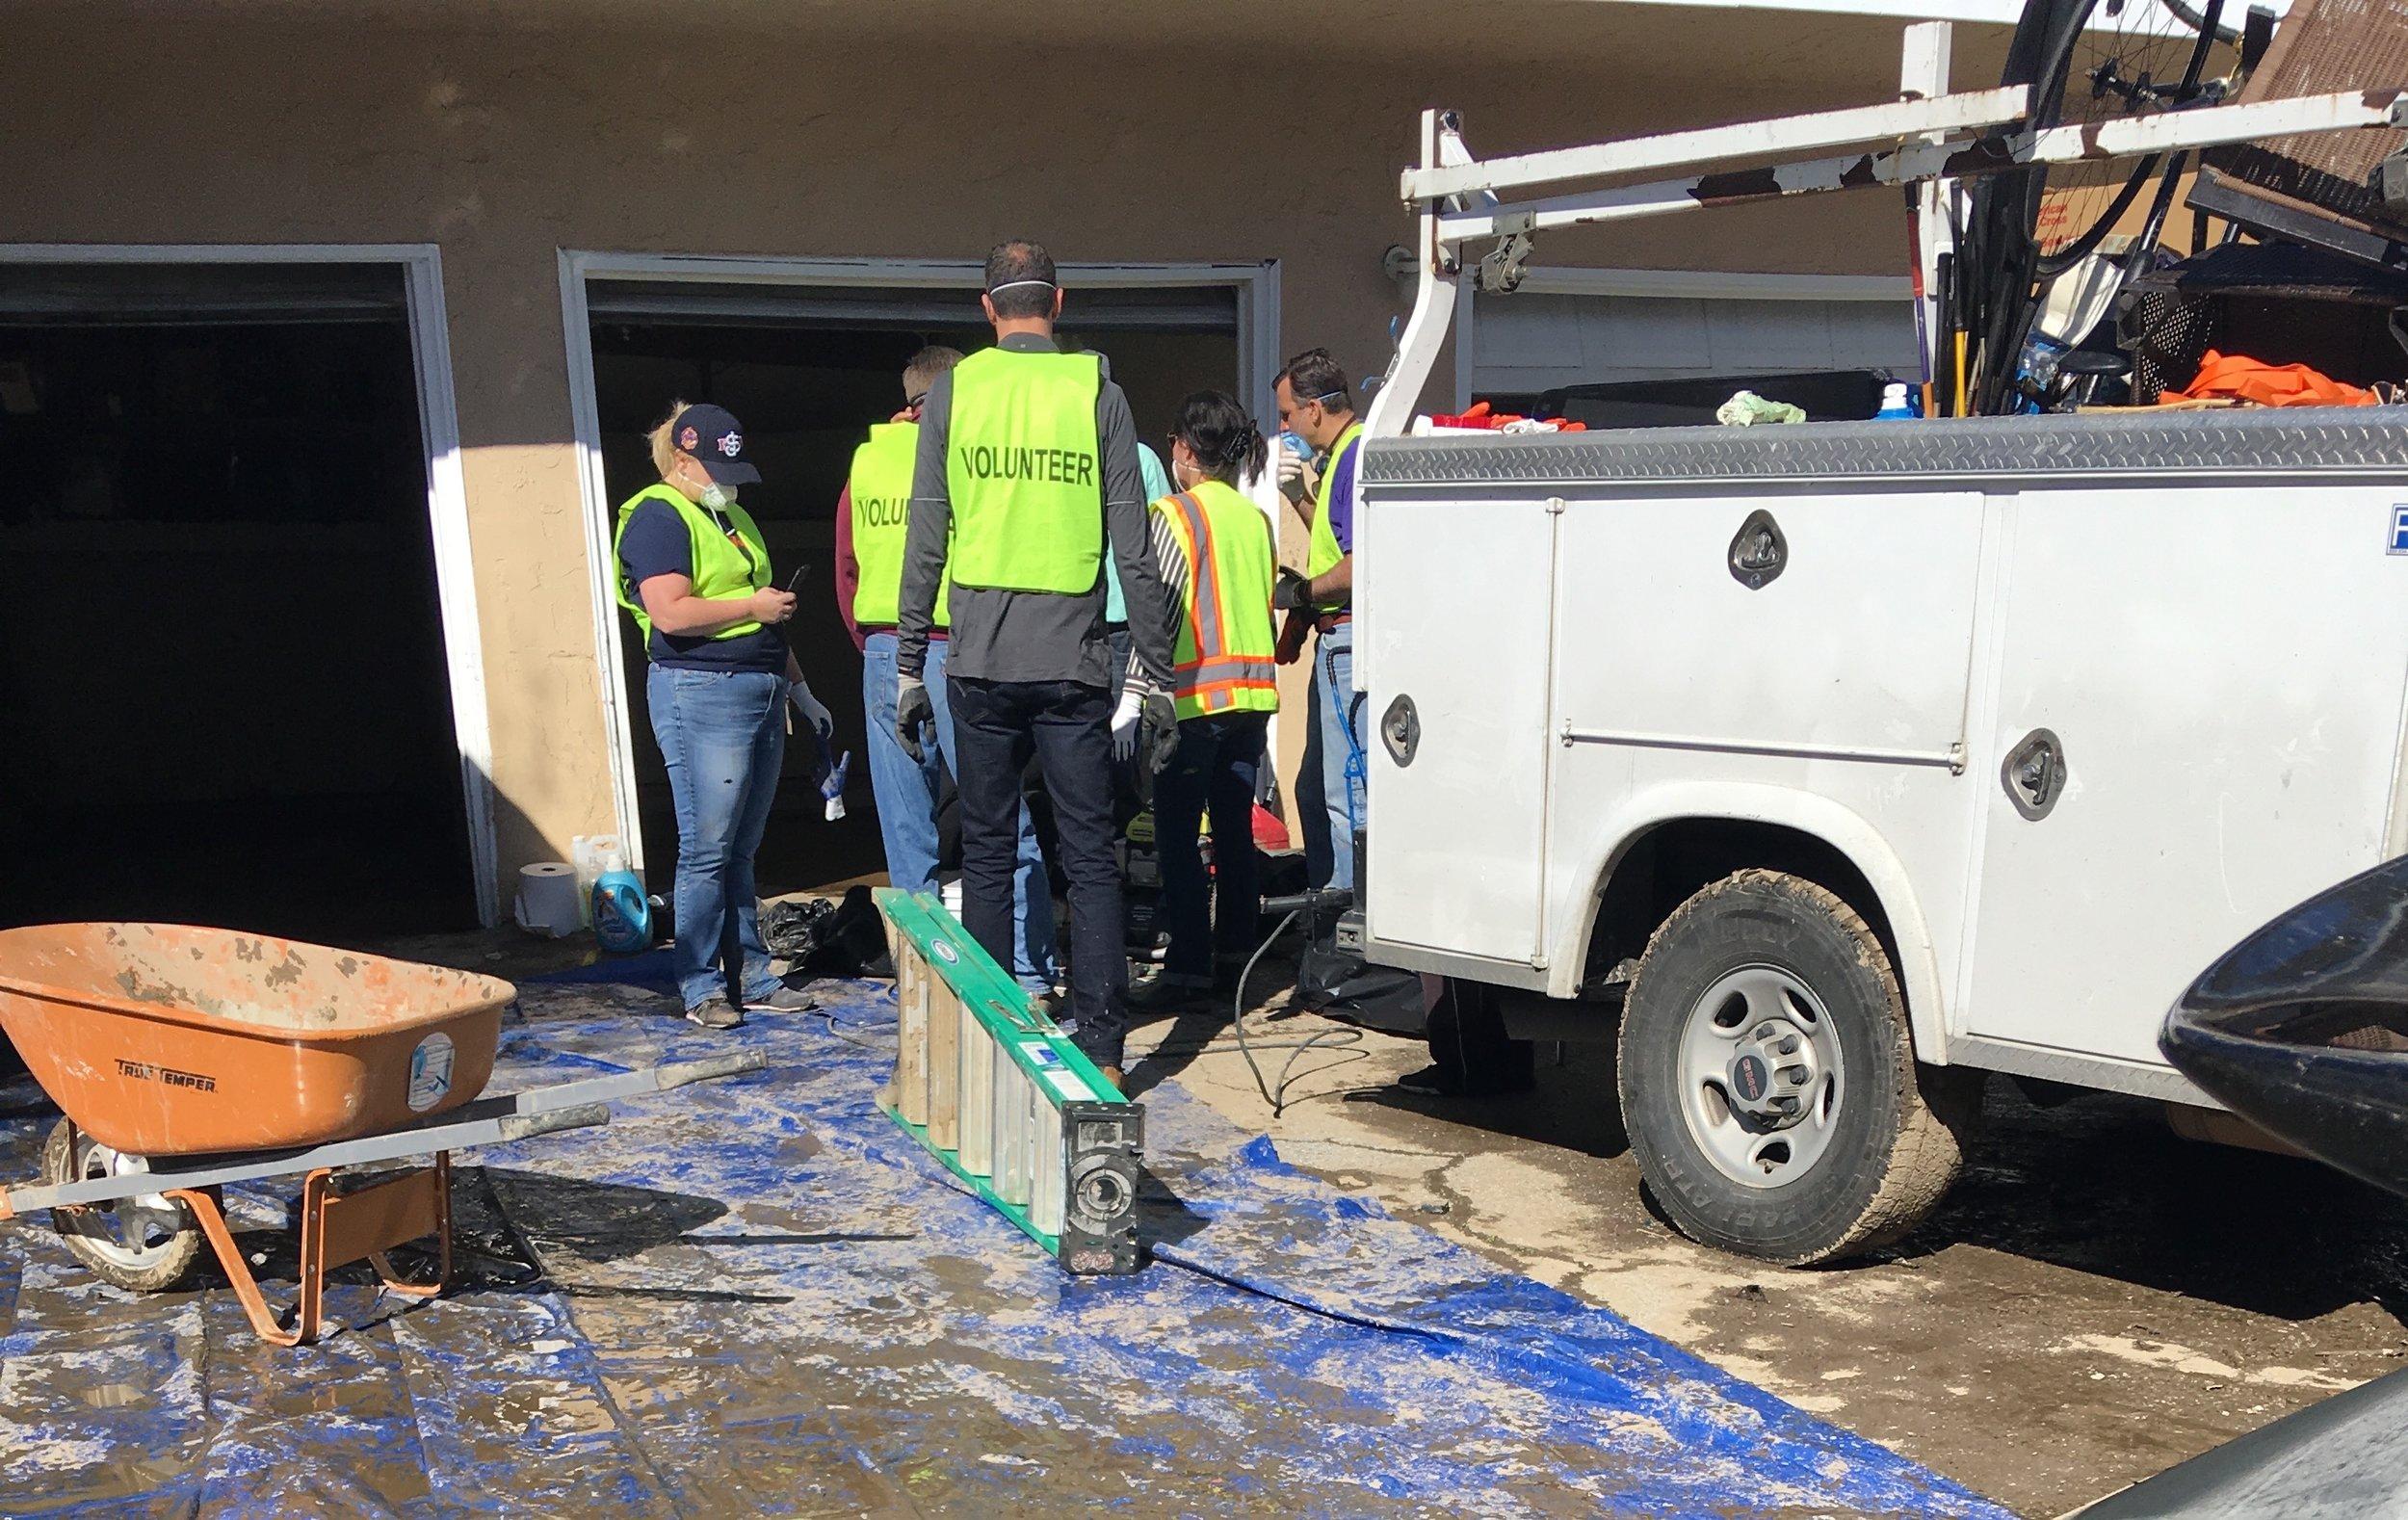 Matt Mahood Sam Liccardo Magdalena Carrasco San Jose Flood Volunteering